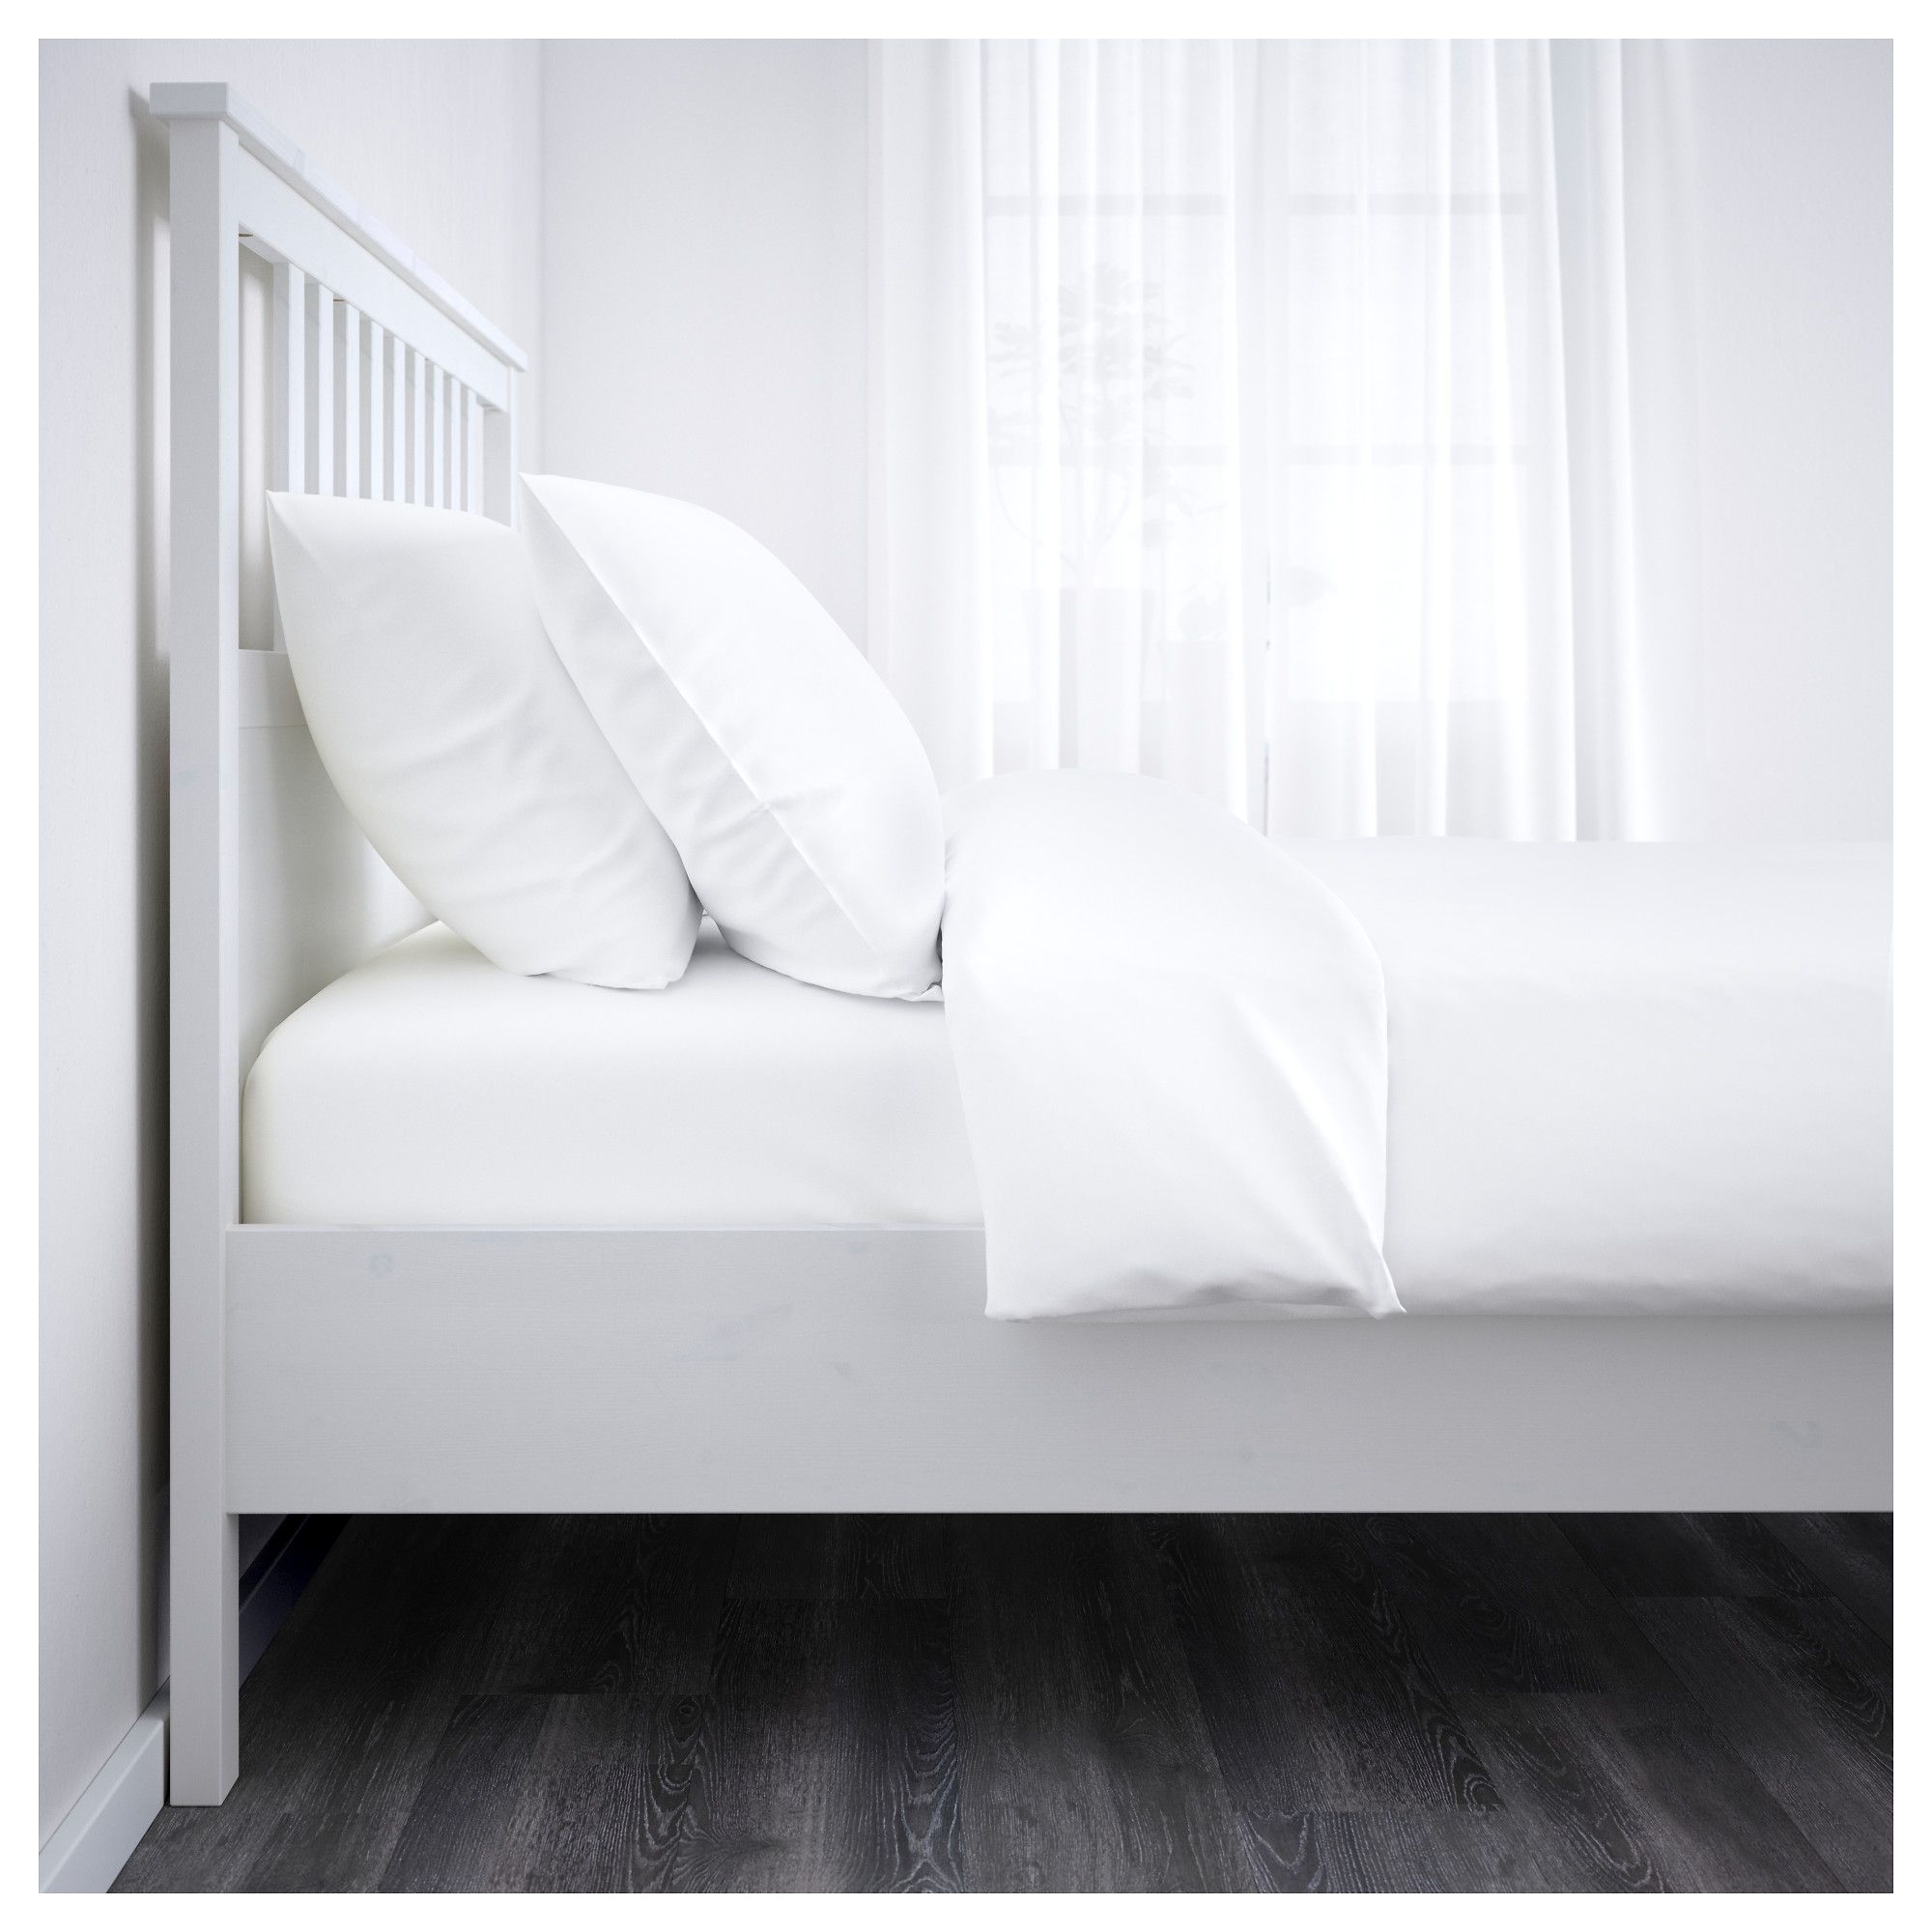 Hemnes Bed Frame White Stain 180x200 Cm Adjustable Beds Hemnes Bed Bed Frame